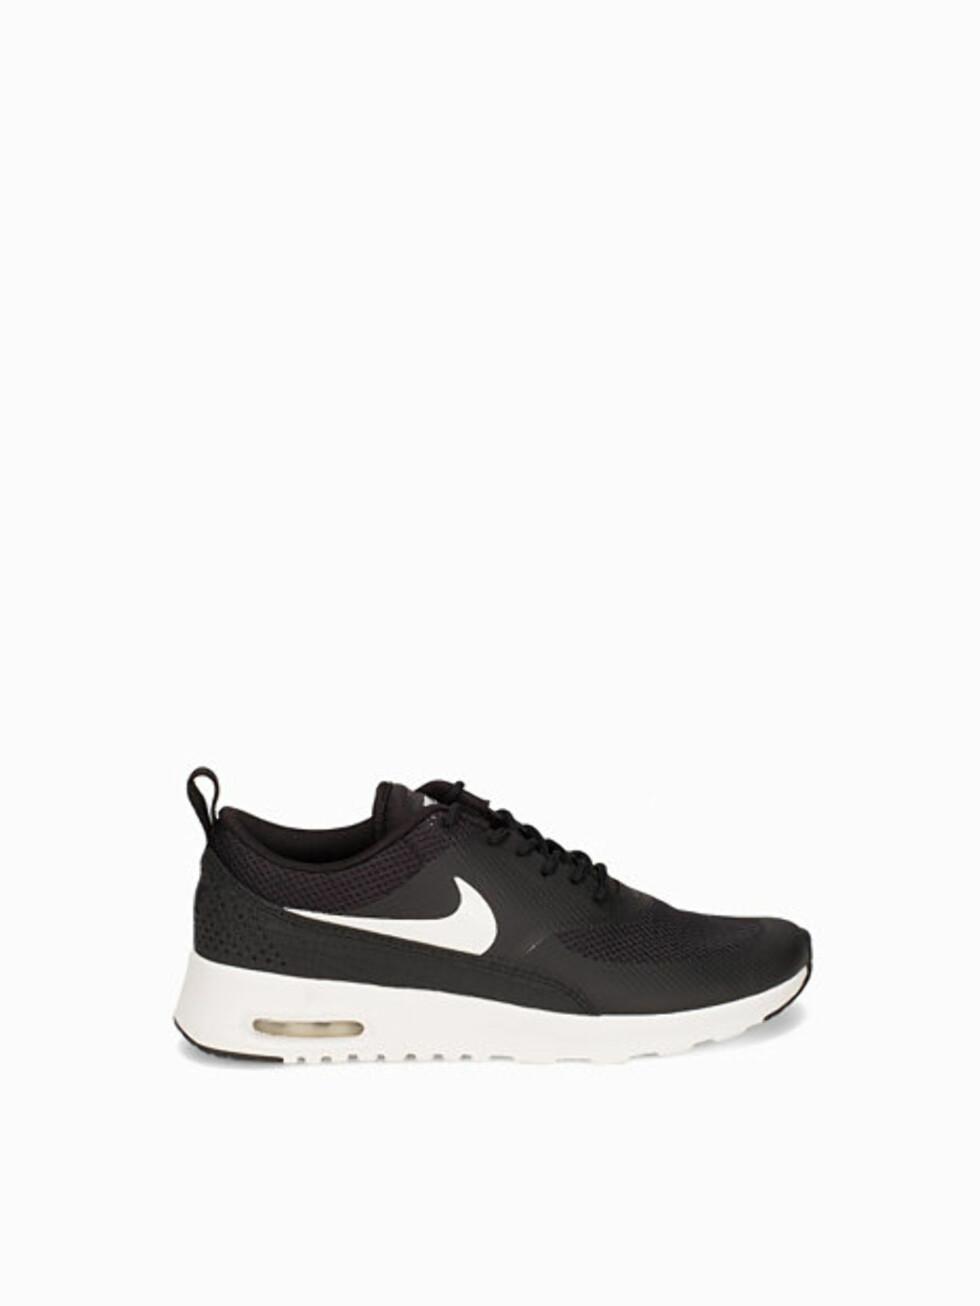 Sko fra Nike via Nelly.com   kr 1149    http://my.nelly.com/link/click/16374